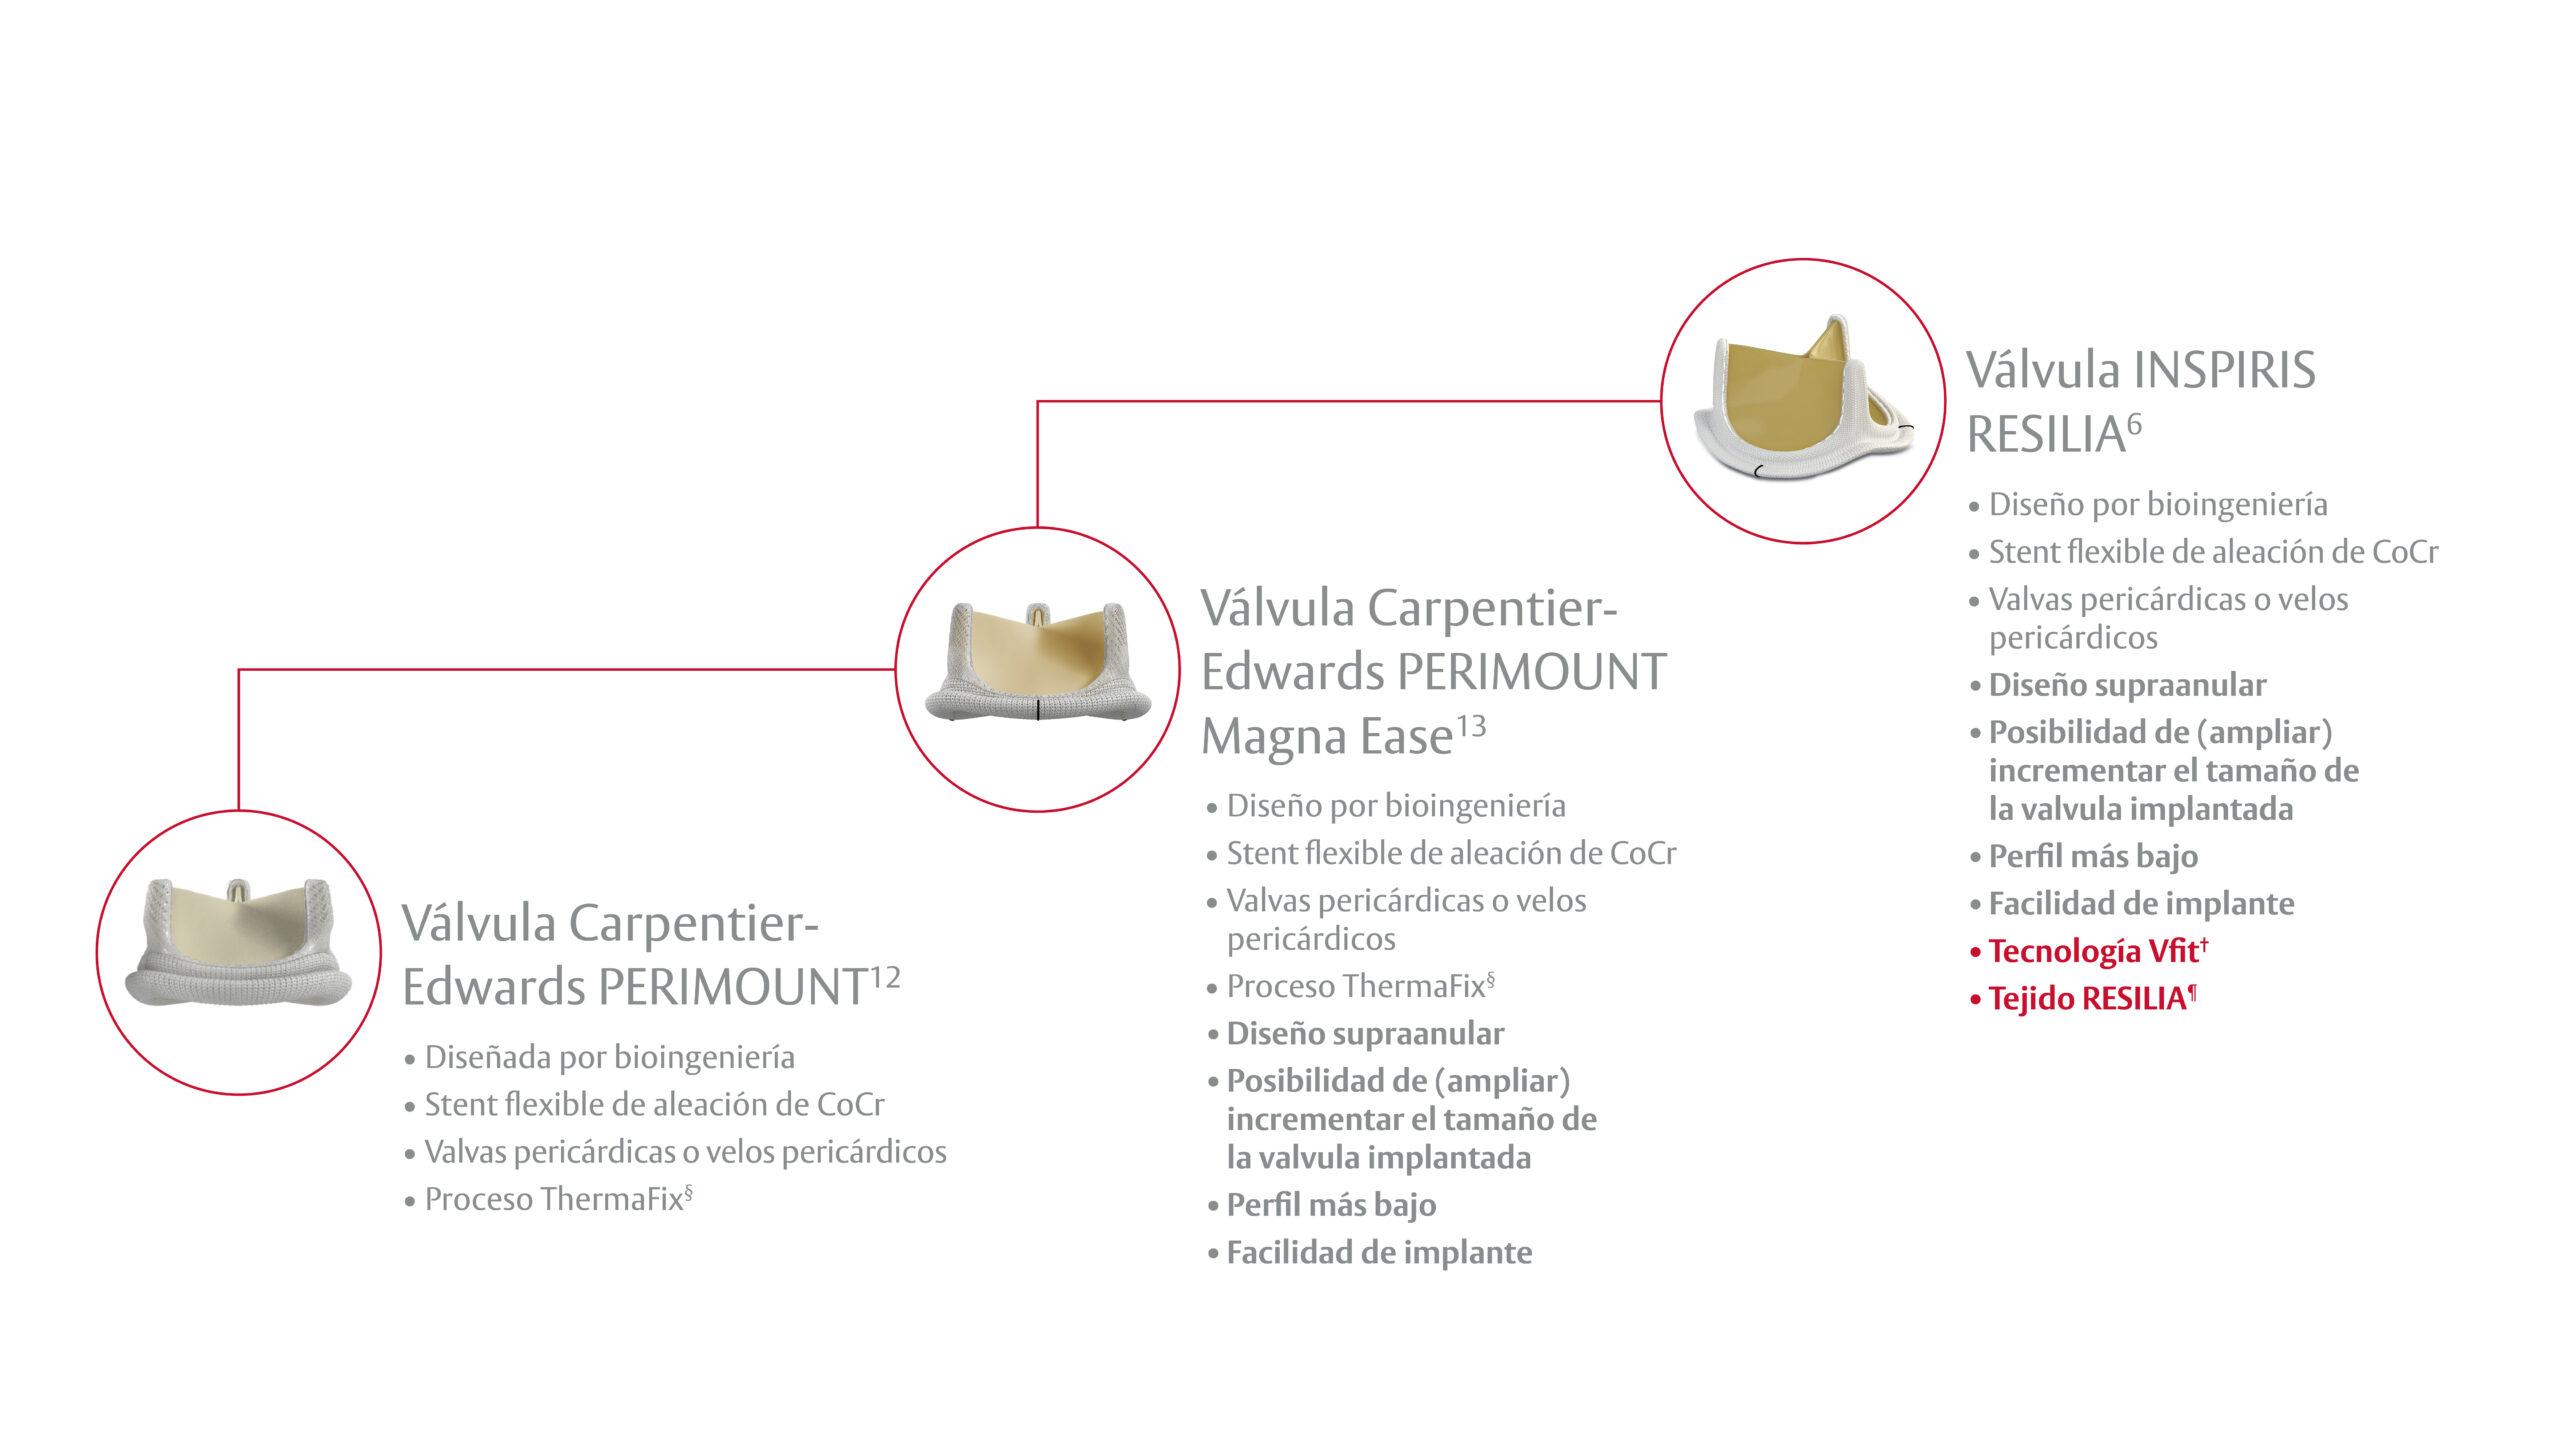 productos valvulares Carpentier-Edwards PERIMOUNT